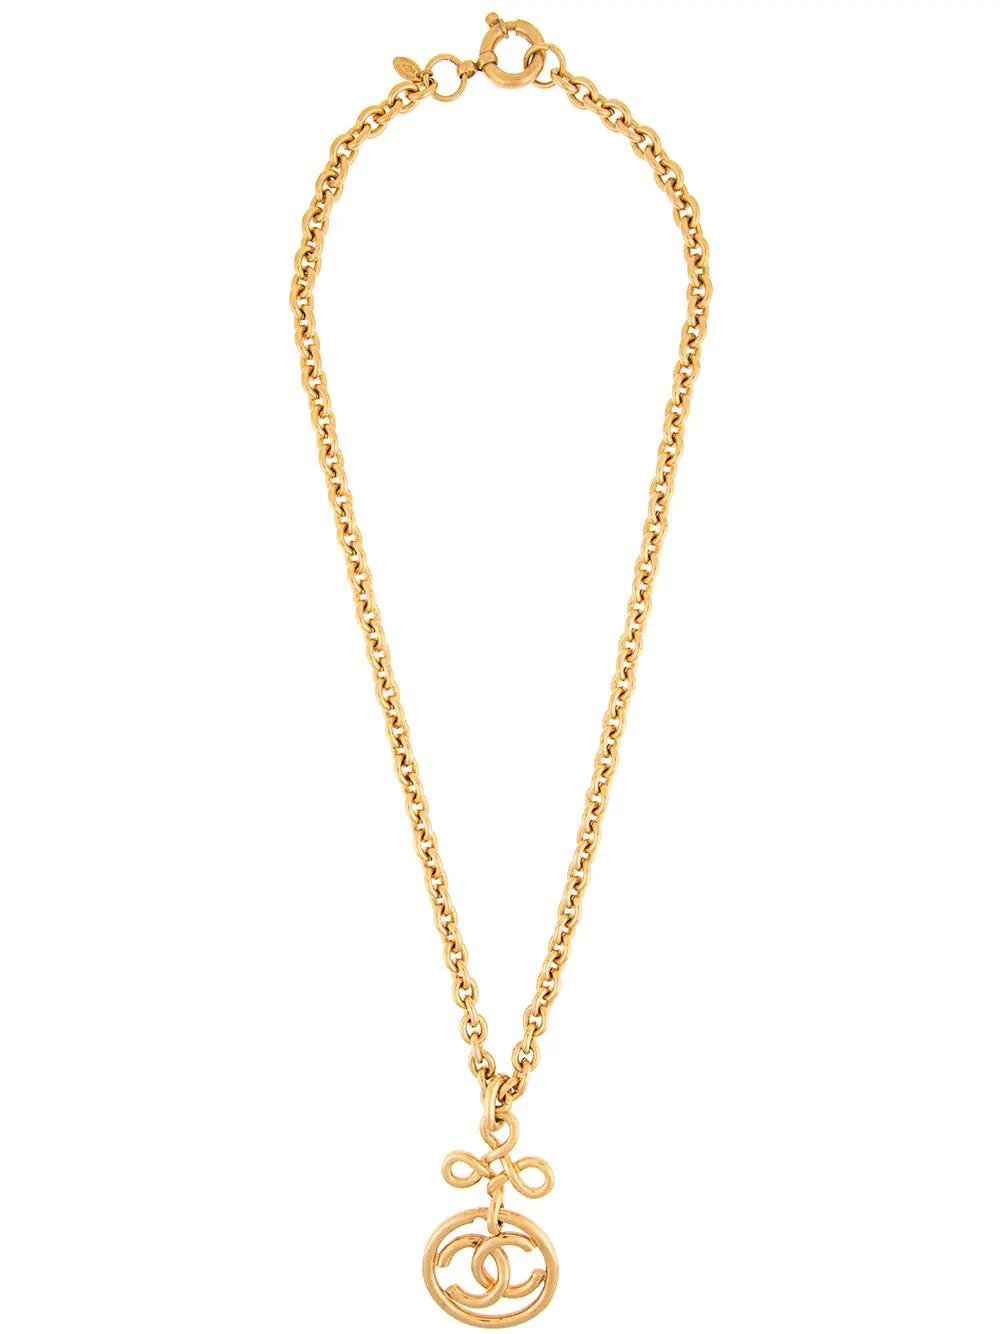 74846916f Chanel Vintage Pendant Necklace Accessories - Metallic | ModeSens